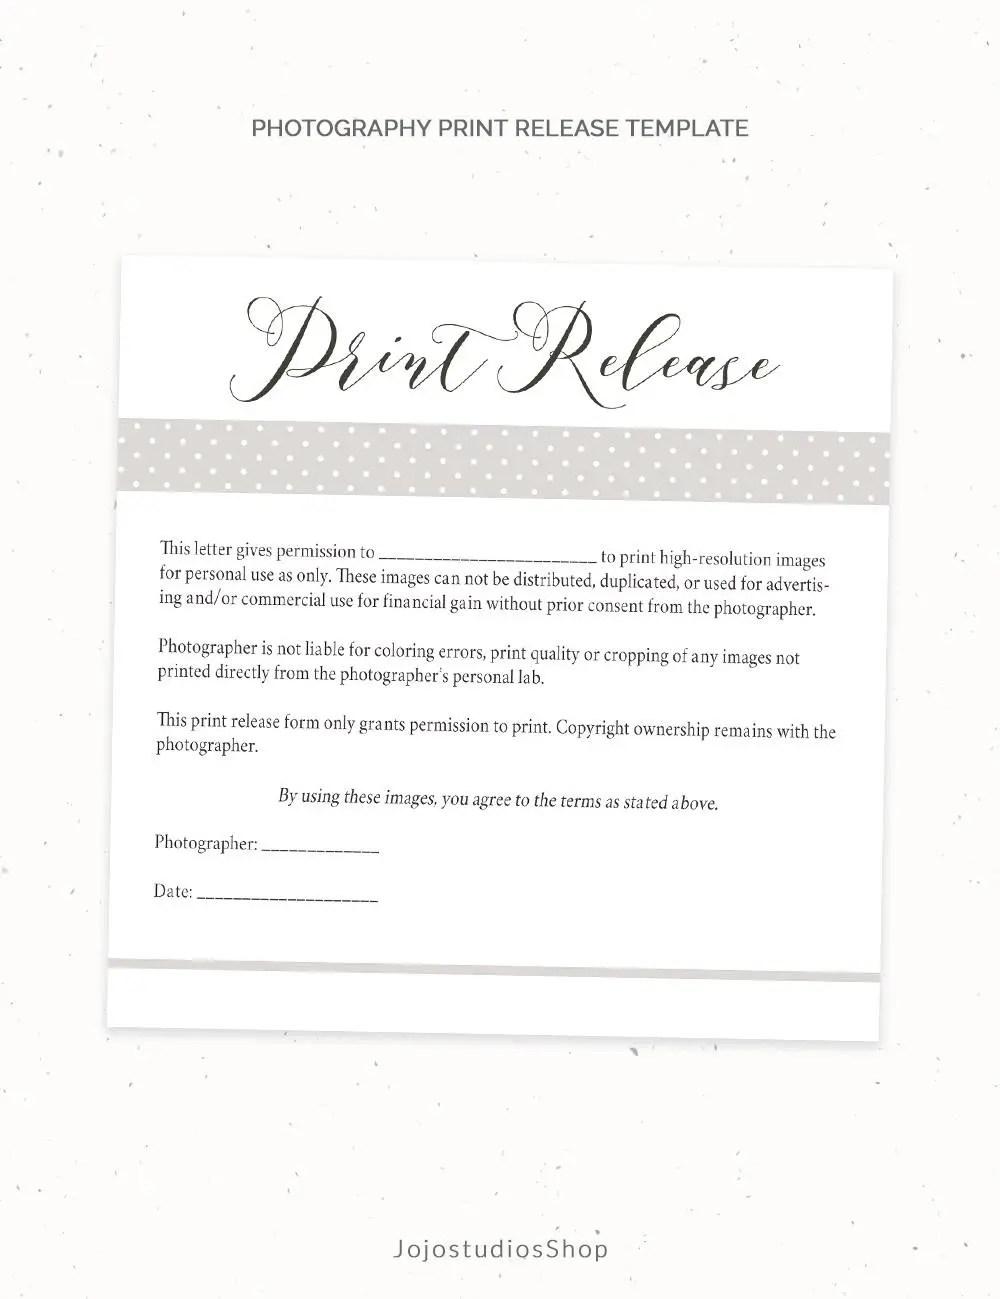 photography print release form template - Kordurmoorddiner